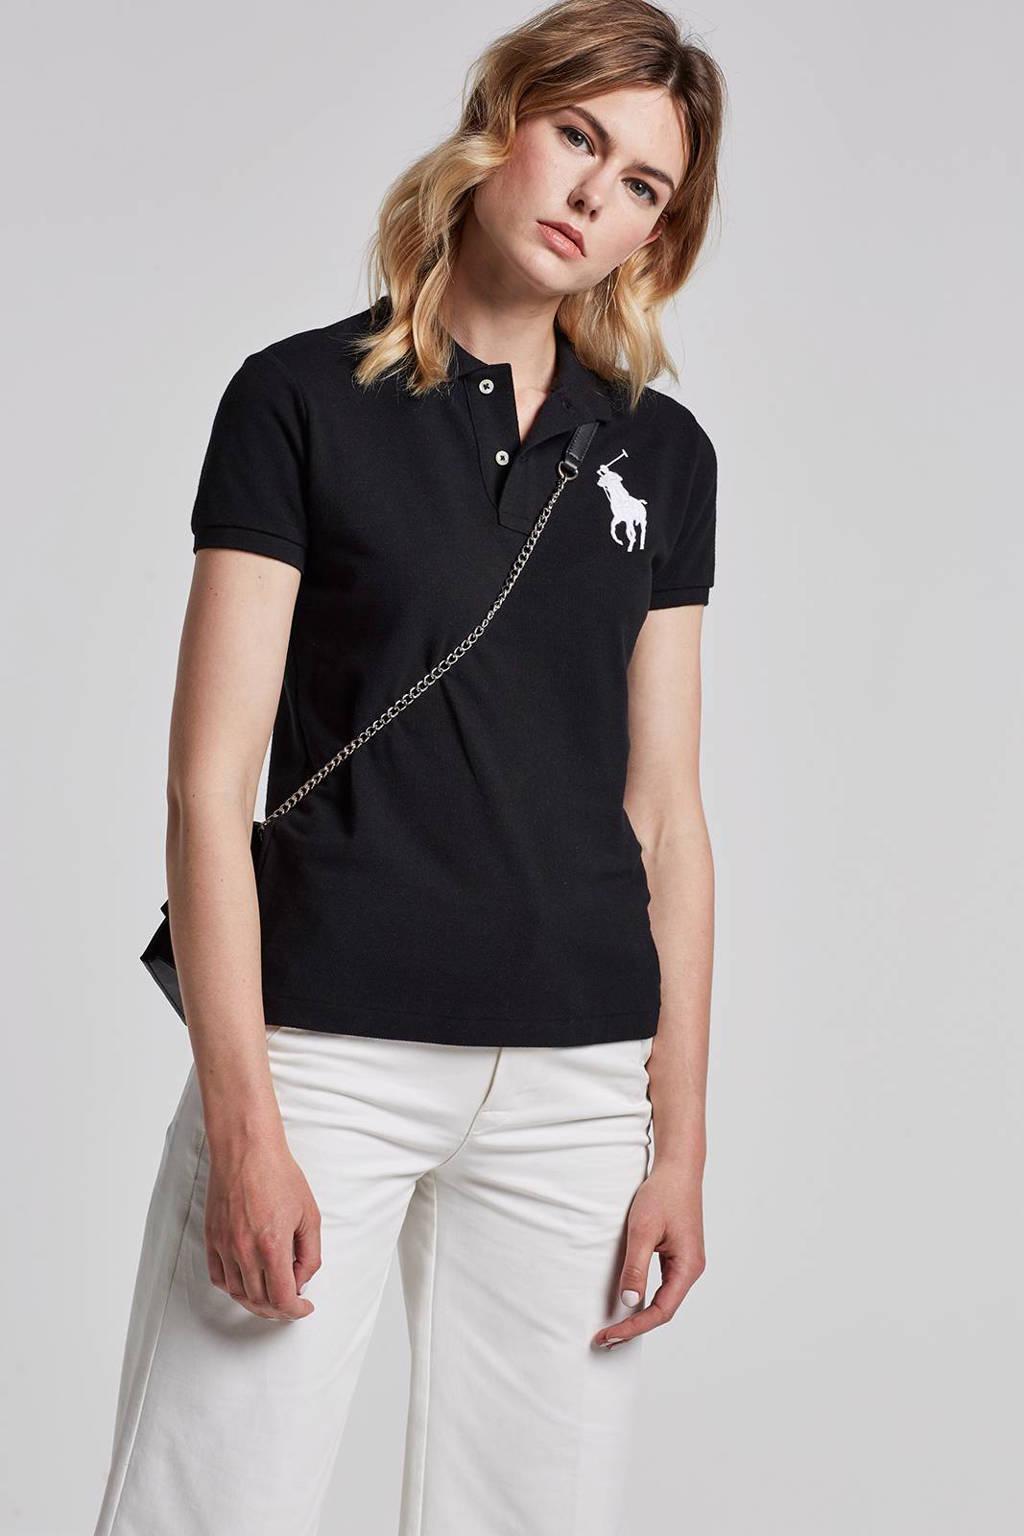 POLO Ralph Lauren skinny fit polo zwart, Zwart/wit